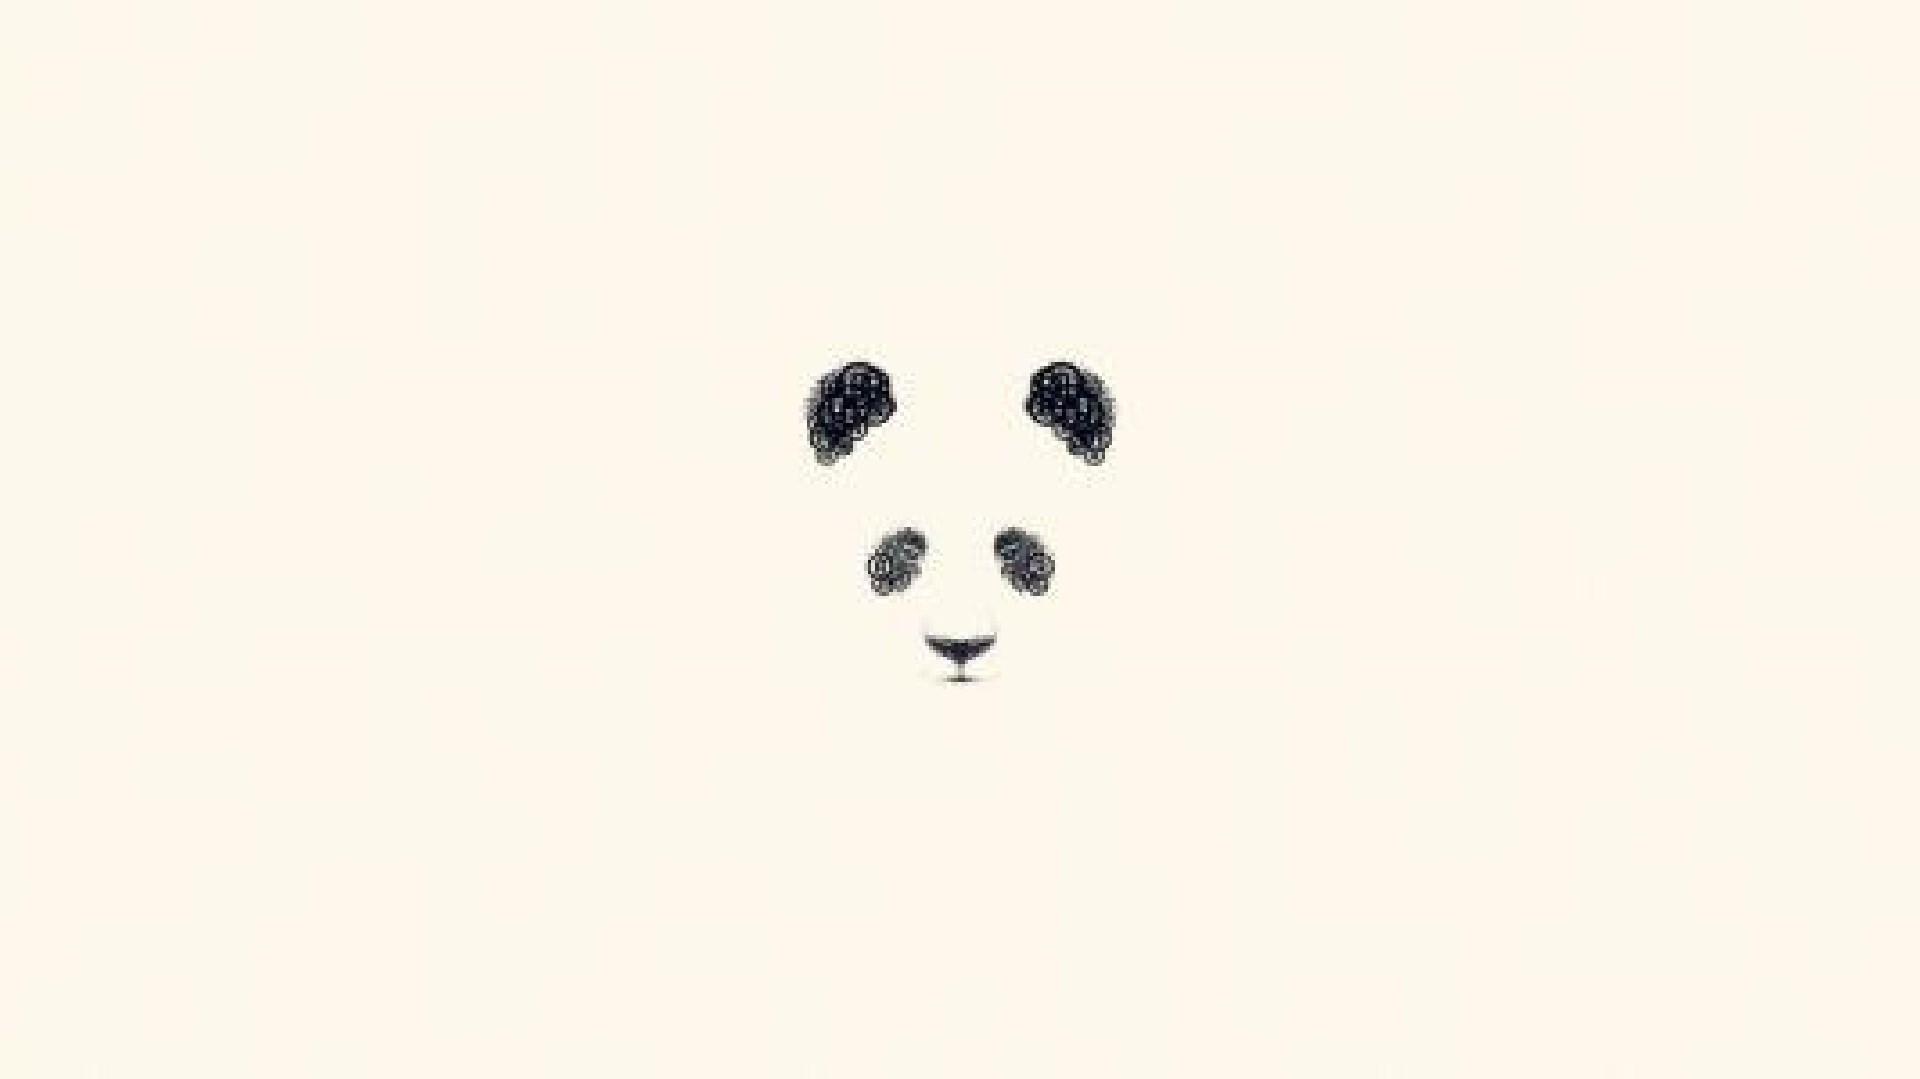 Panda shadow